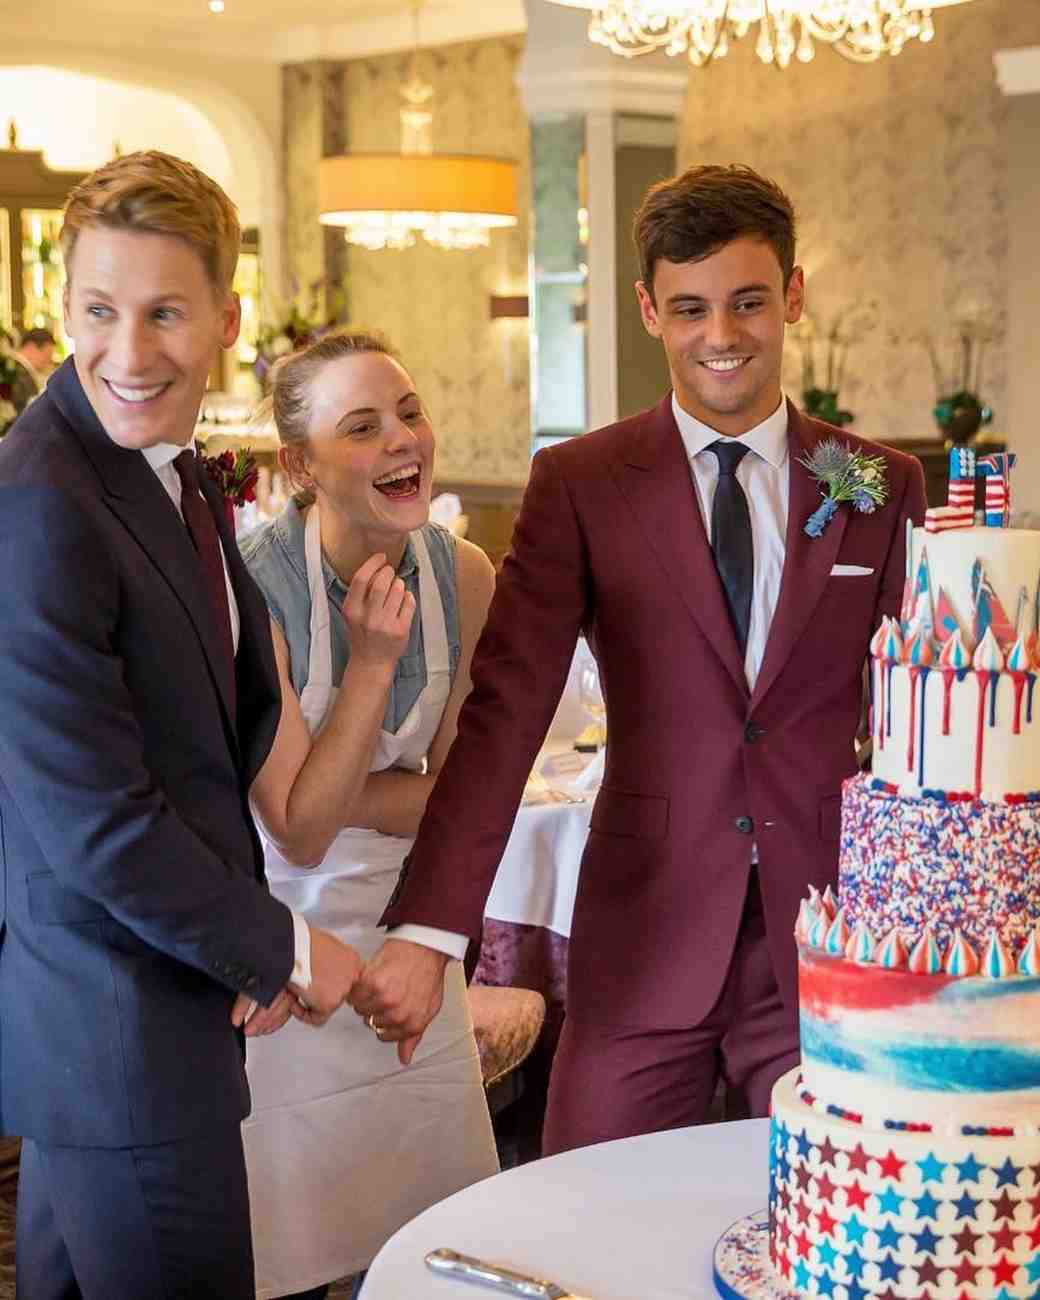 Tom Daley surprises Dustin Lance Black with a patriotic wedding cake